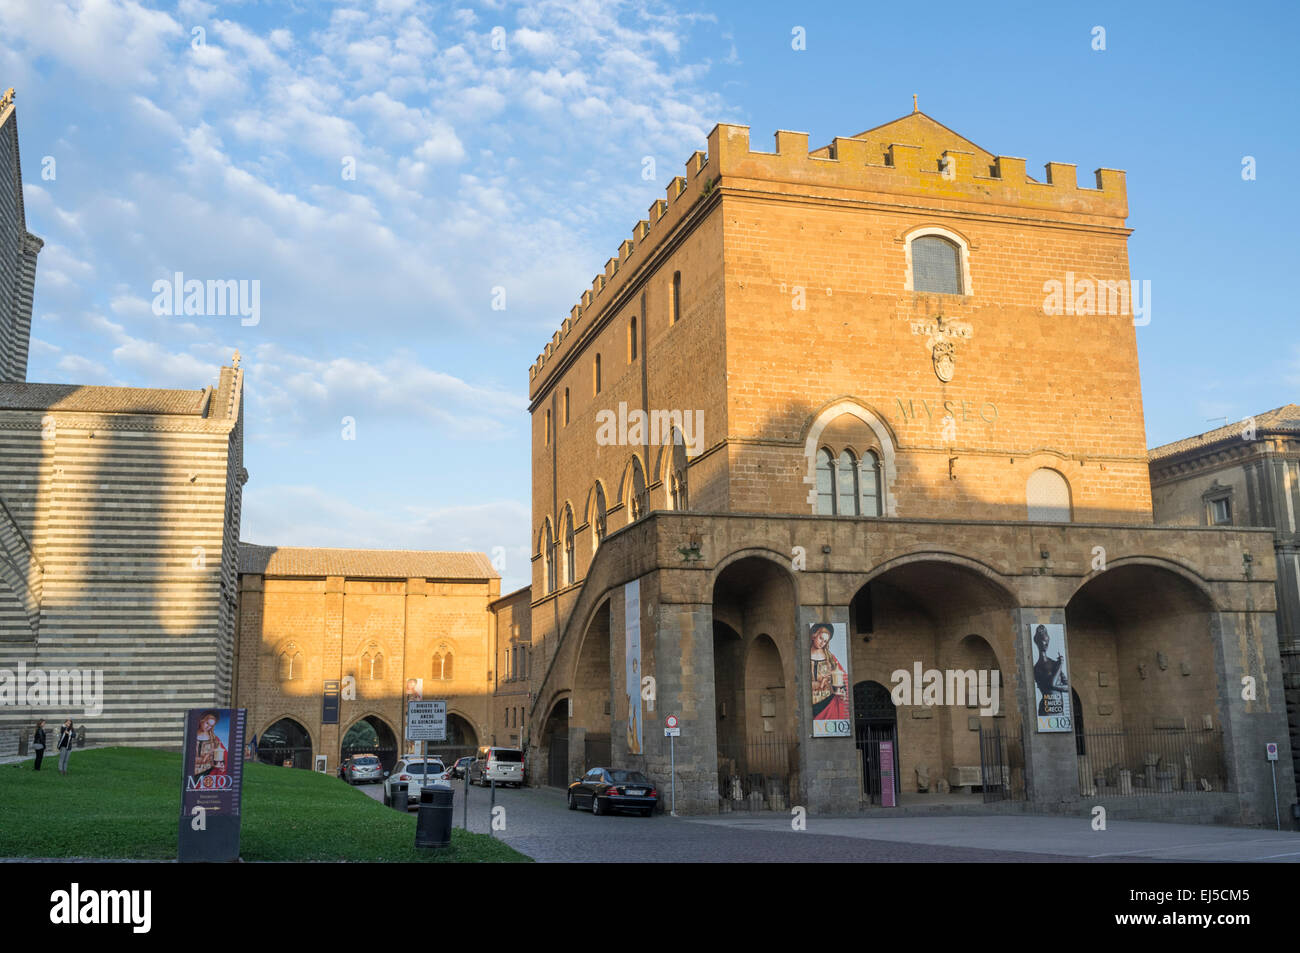 Palazzo Soliano, the papal palace of Orvieto, Umbria, Italy - Stock Image